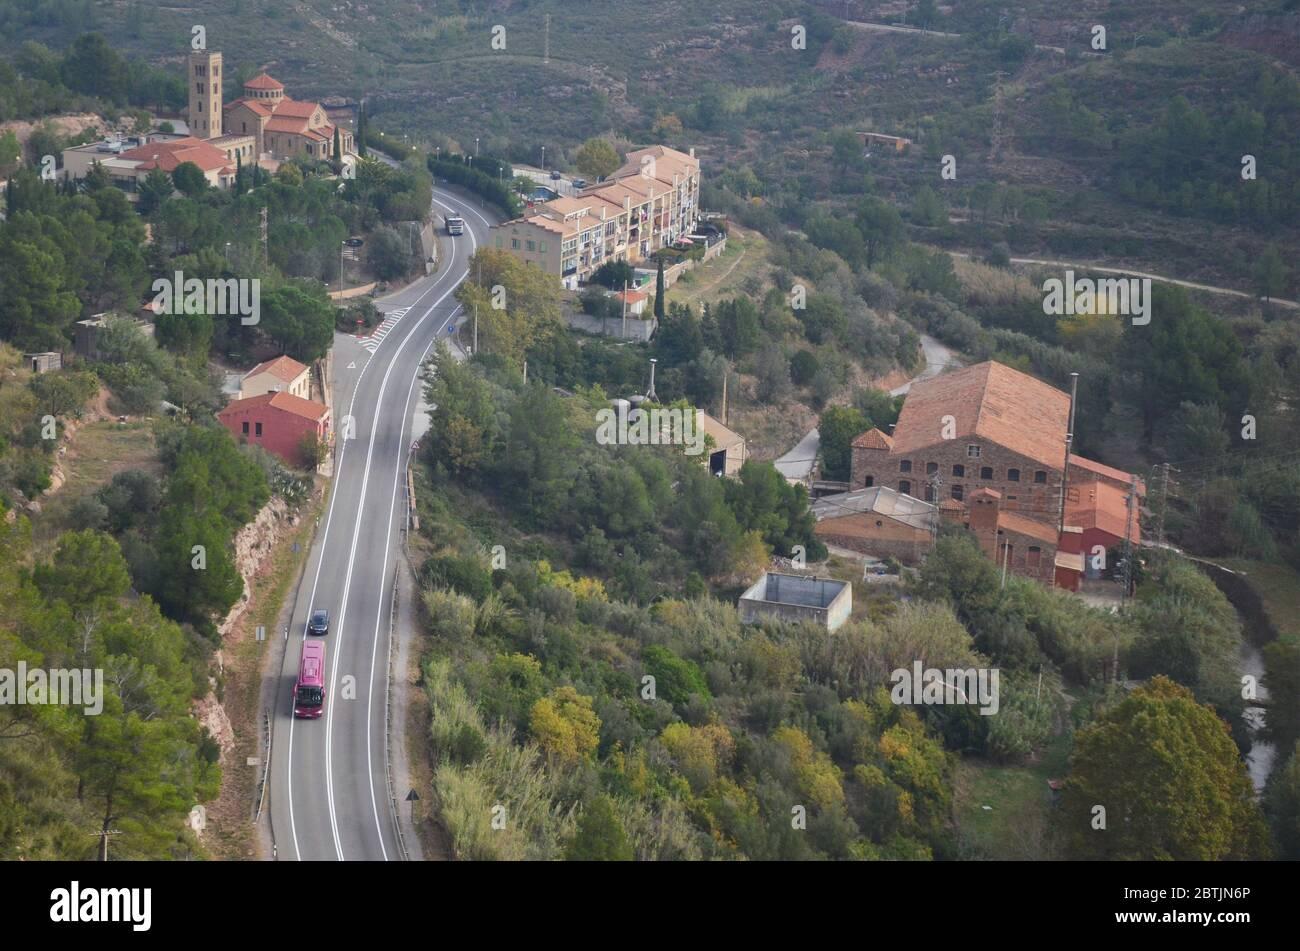 Montserrat is a multi-peaked mountain range near Barcelona, in Catalonia, Spain. It is part of the Catalan Pre-Coastal Range Stock Photo